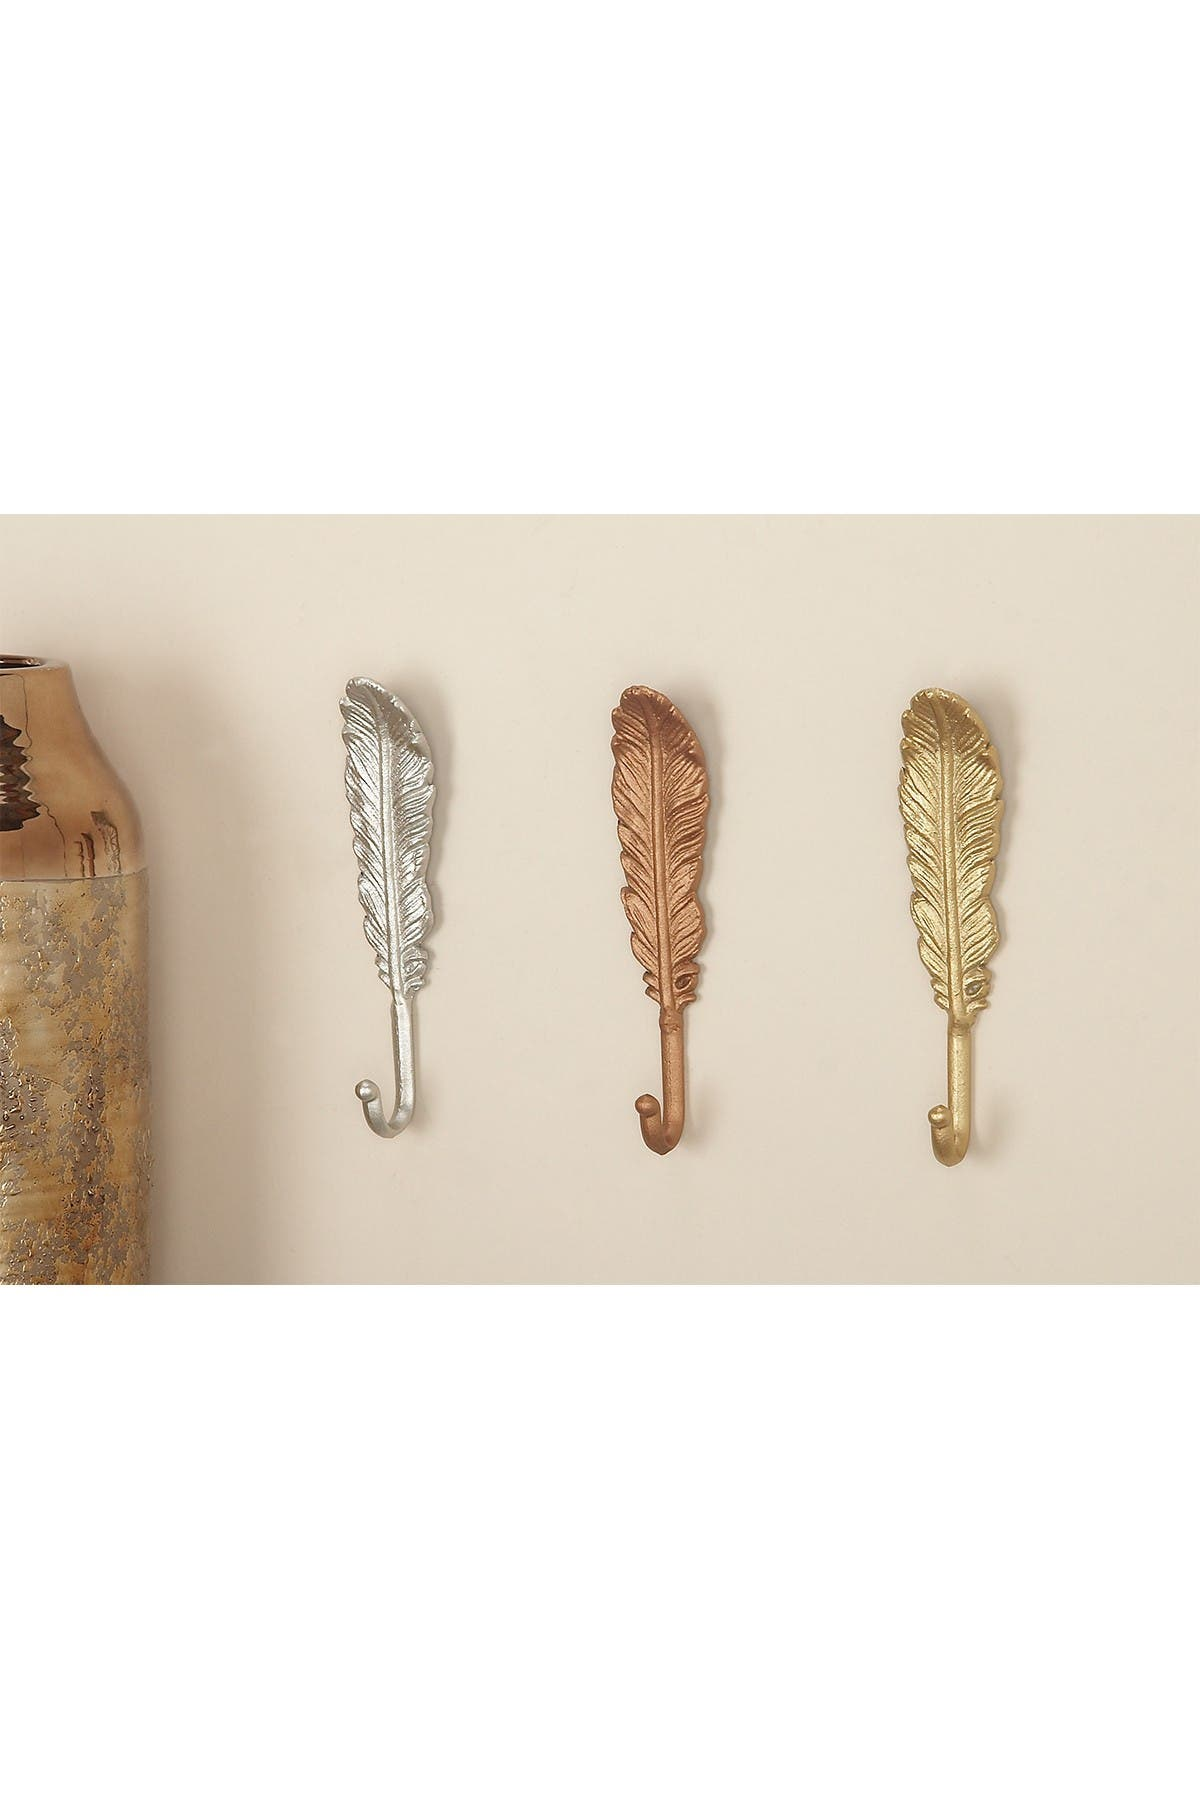 Image of CosmoLiving by Cosmopolitan Metal Feather Hook - Set of 3